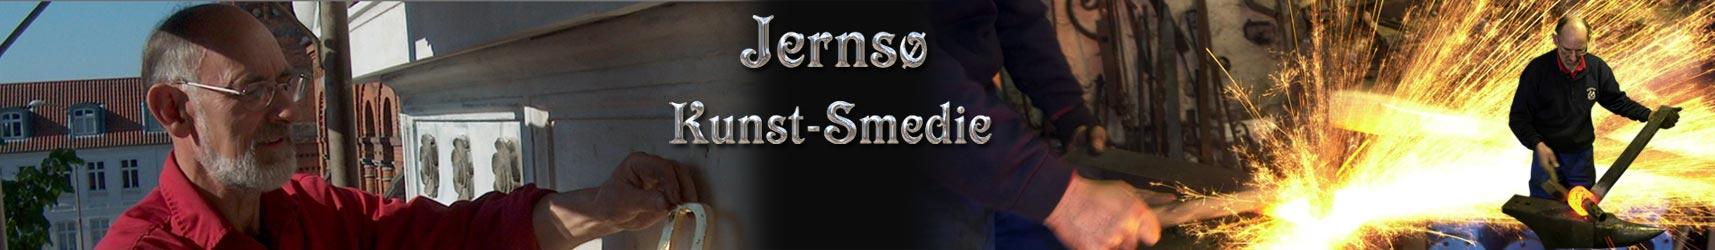 Jernsø Kunst Smedie